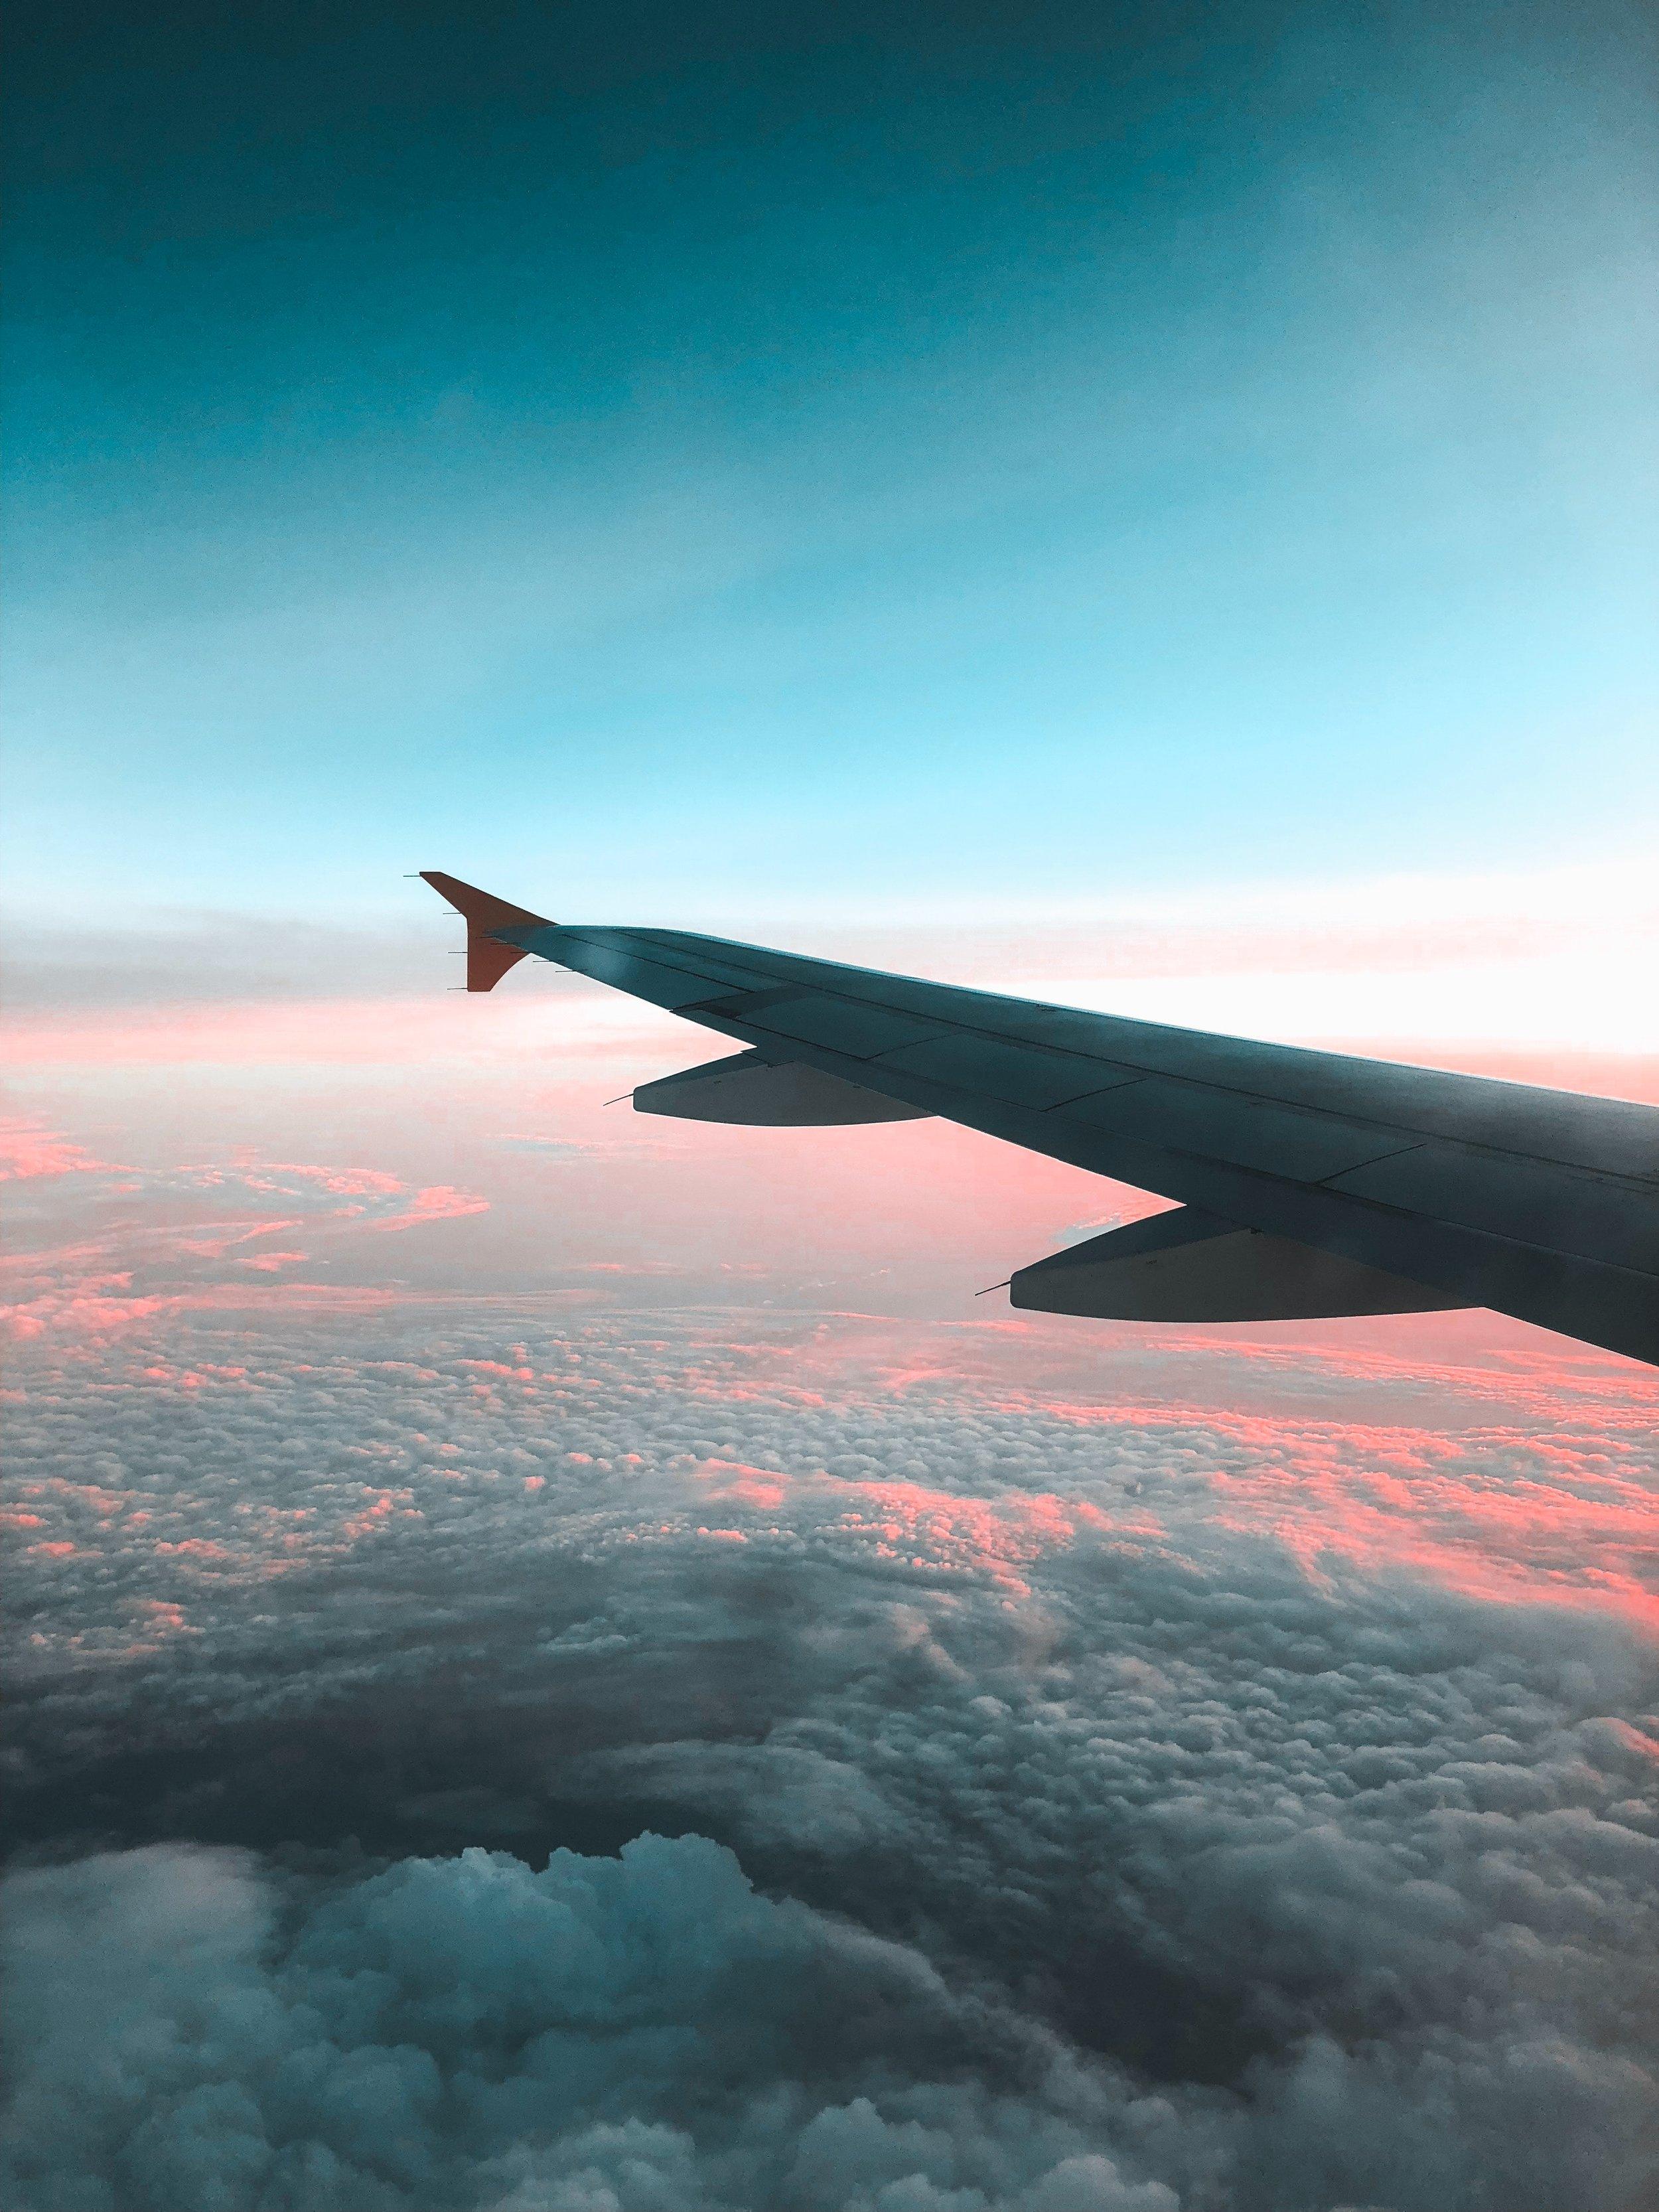 aircraft-airplane-airplane-wing-2147486.jpg